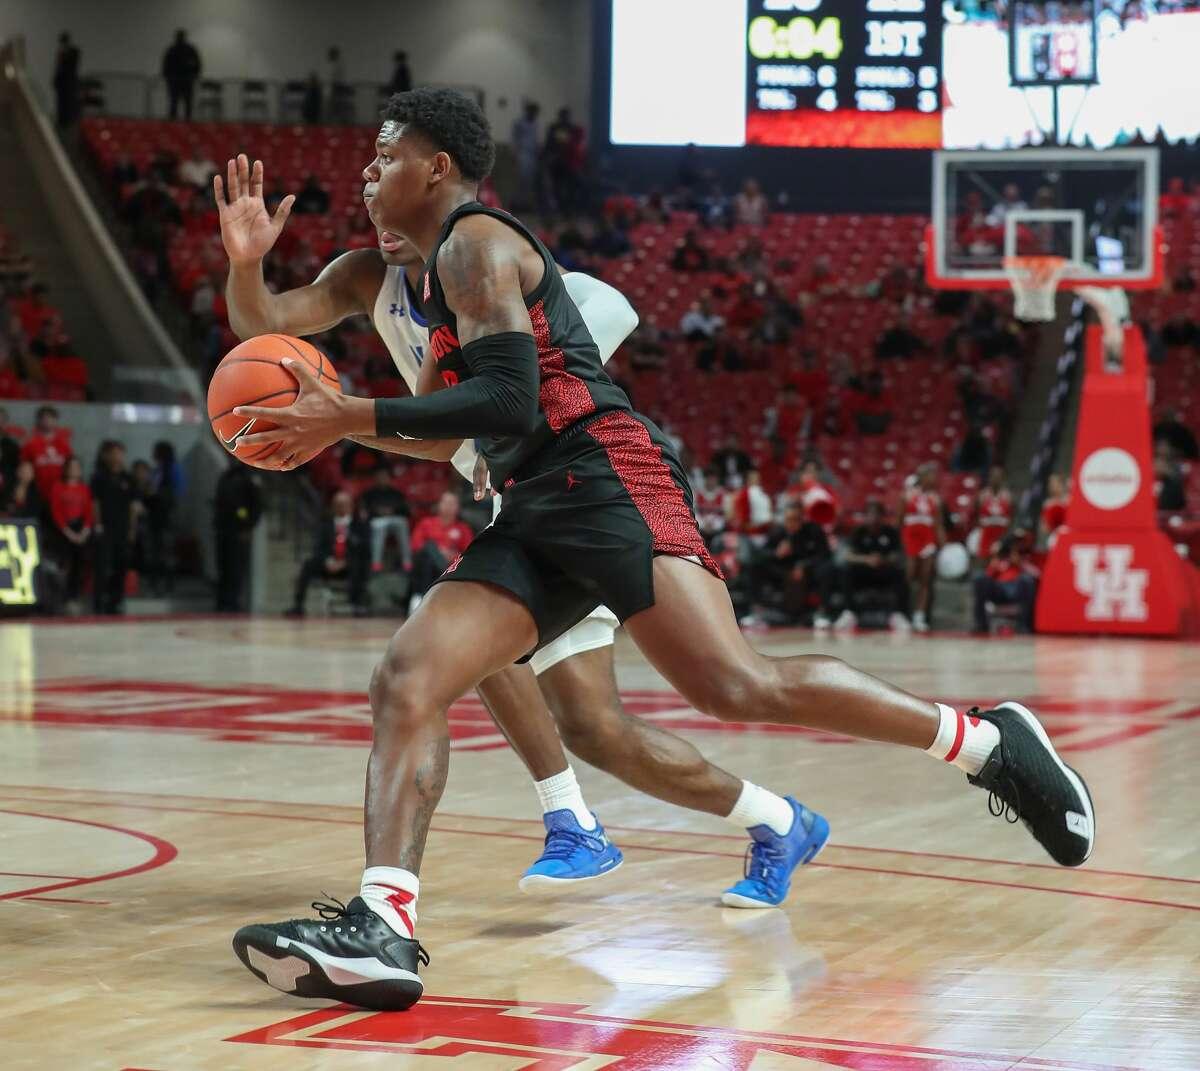 Houston Cougars guard Marcus Sasser (0)drives around Texas-Arlington Mavericks forward Jordan Phillips (2) during the first half of an NCAA basketball game at Fertitta Center Wednesday, Dec. 11, 2019, in Houston.